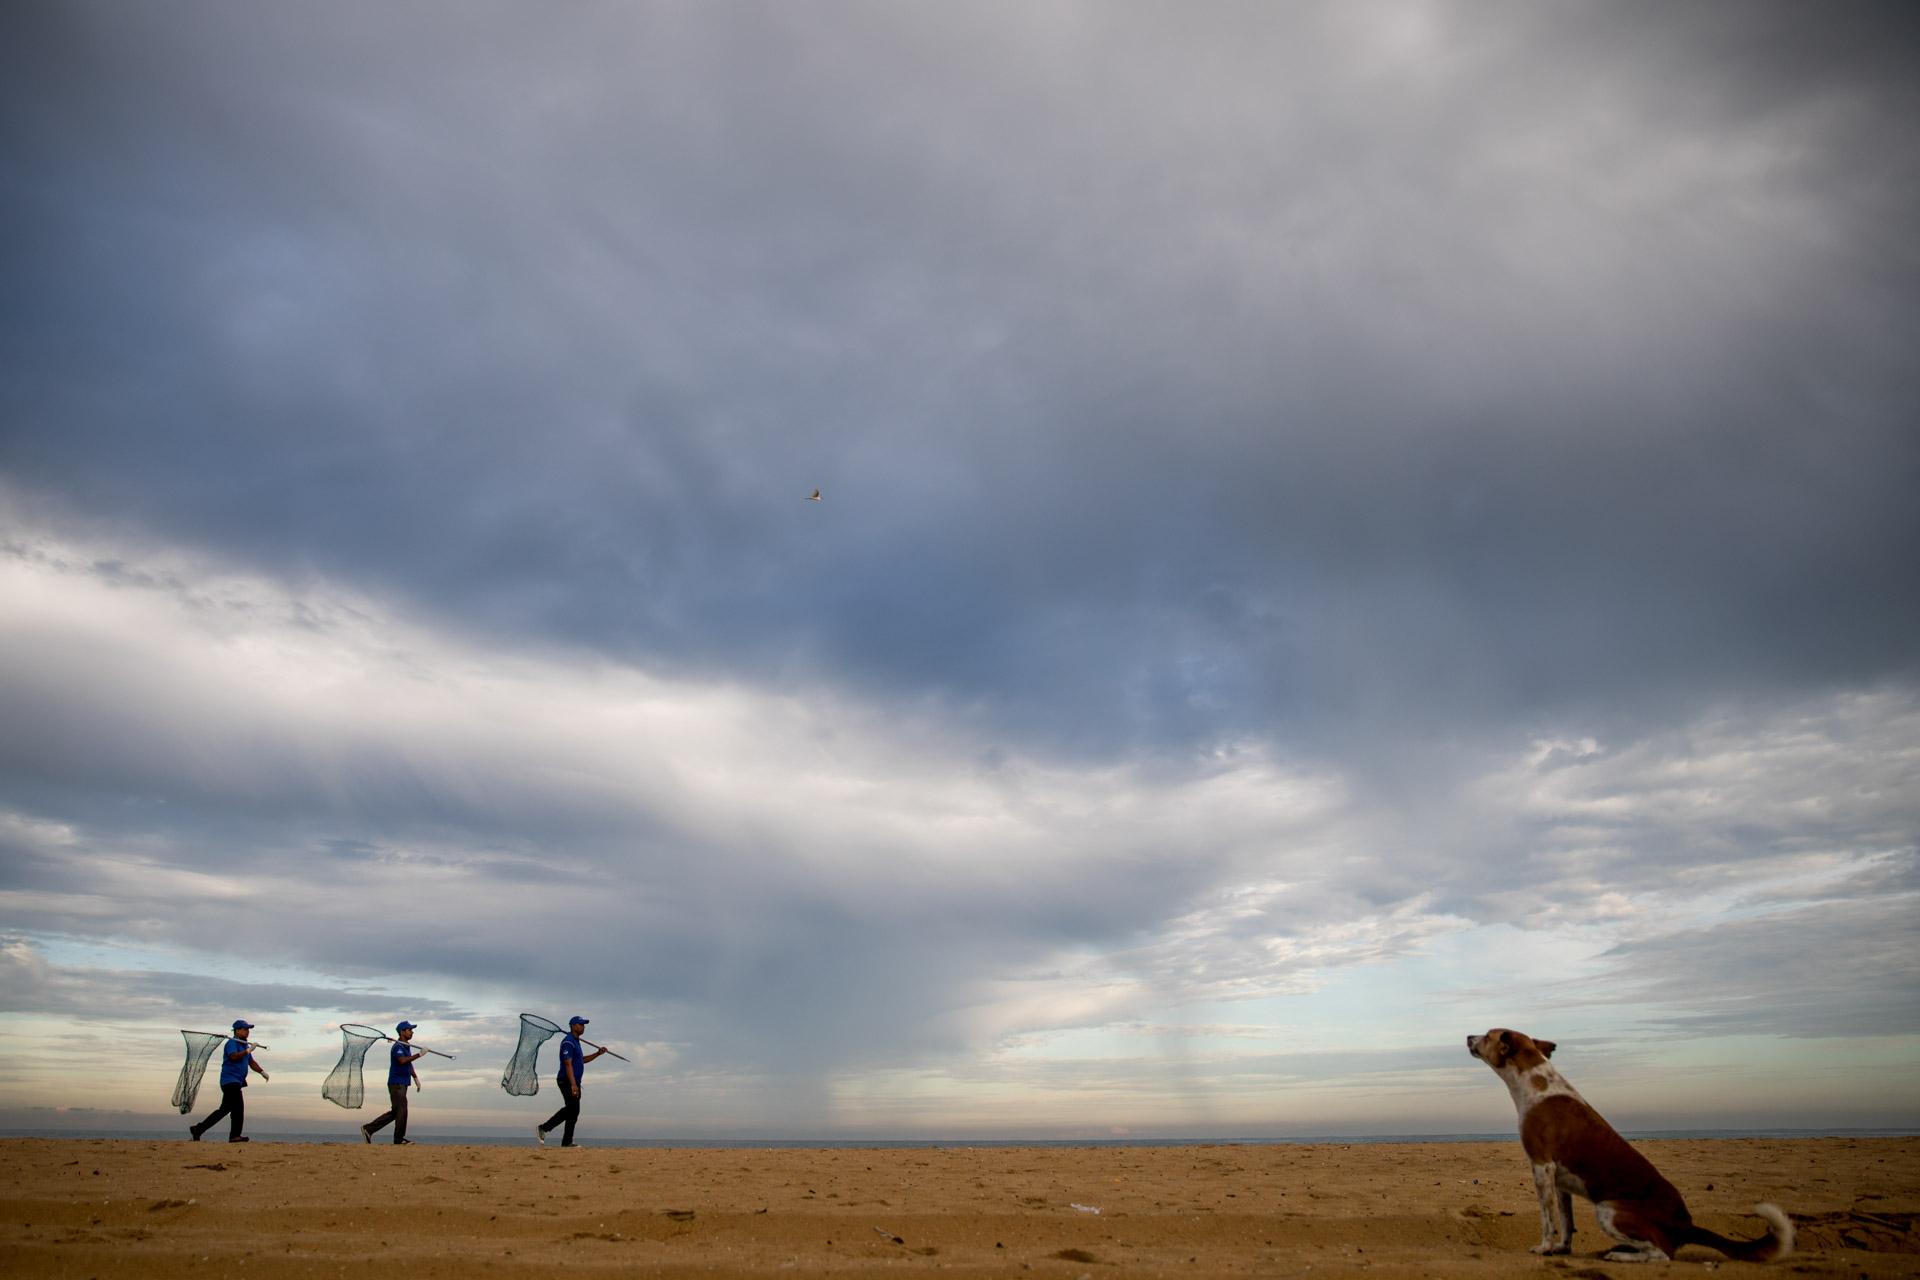 London Charity, NGO and Travel Documentary Photographer